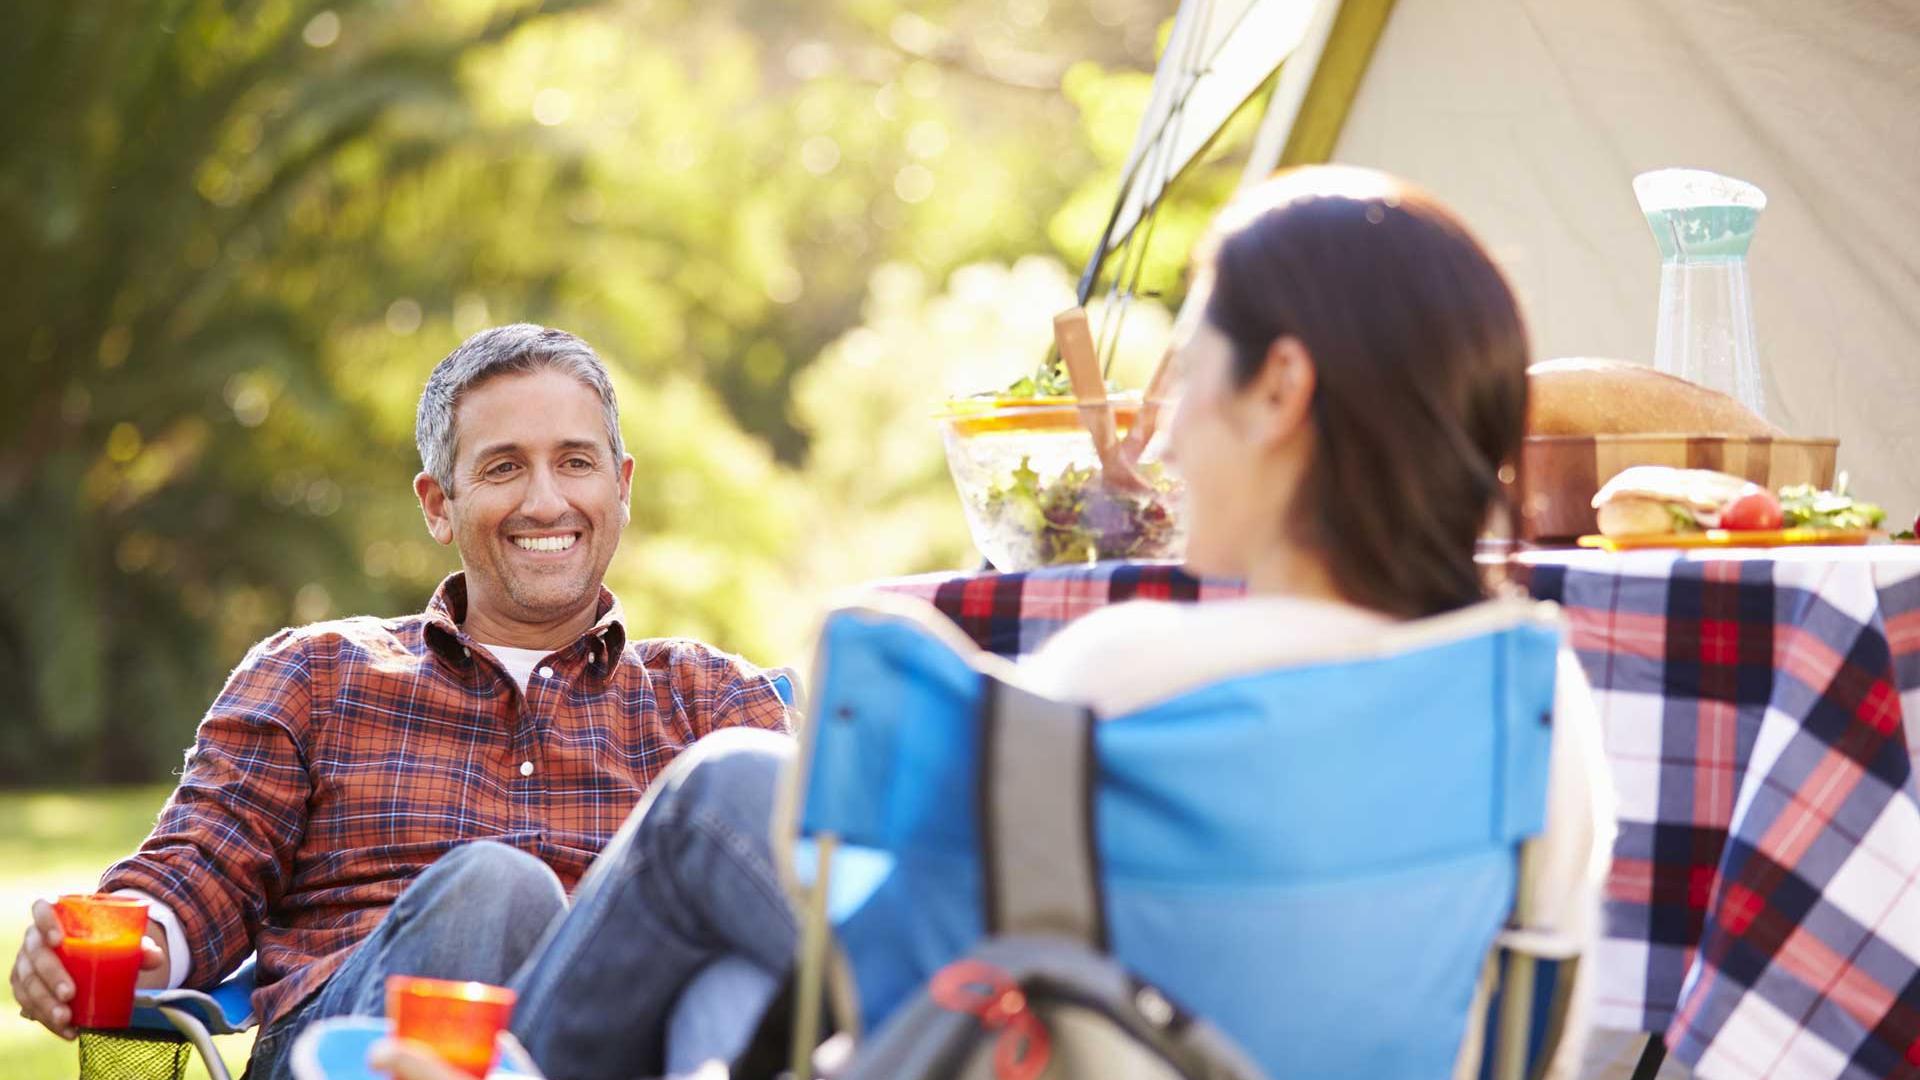 Camping in Niedersachsen - Paar beim Picknick